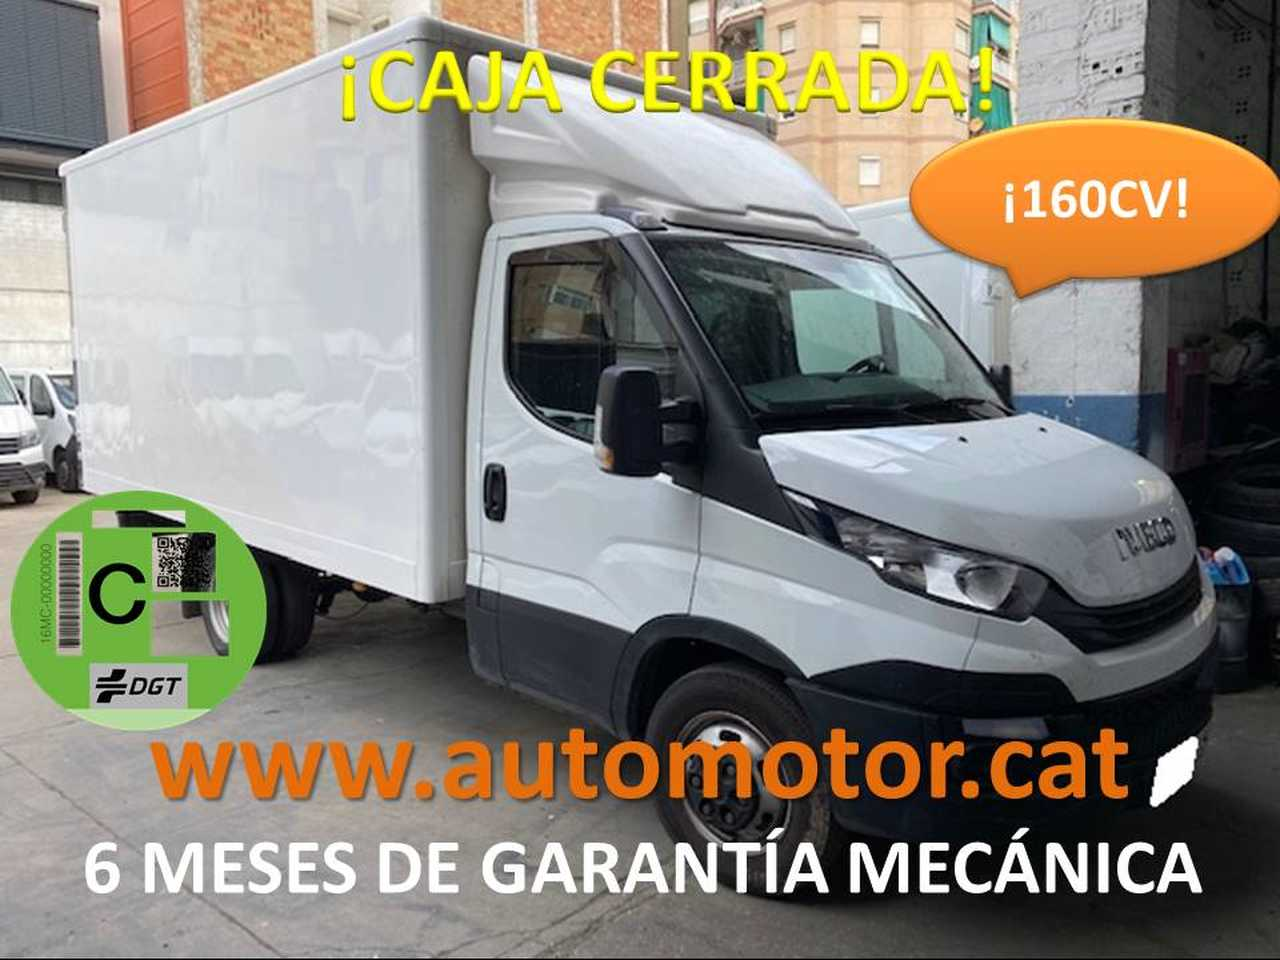 Iveco Daily Chasis Cabina 35C16 3750 160 - GARANTIA MECANICA  - Foto 1